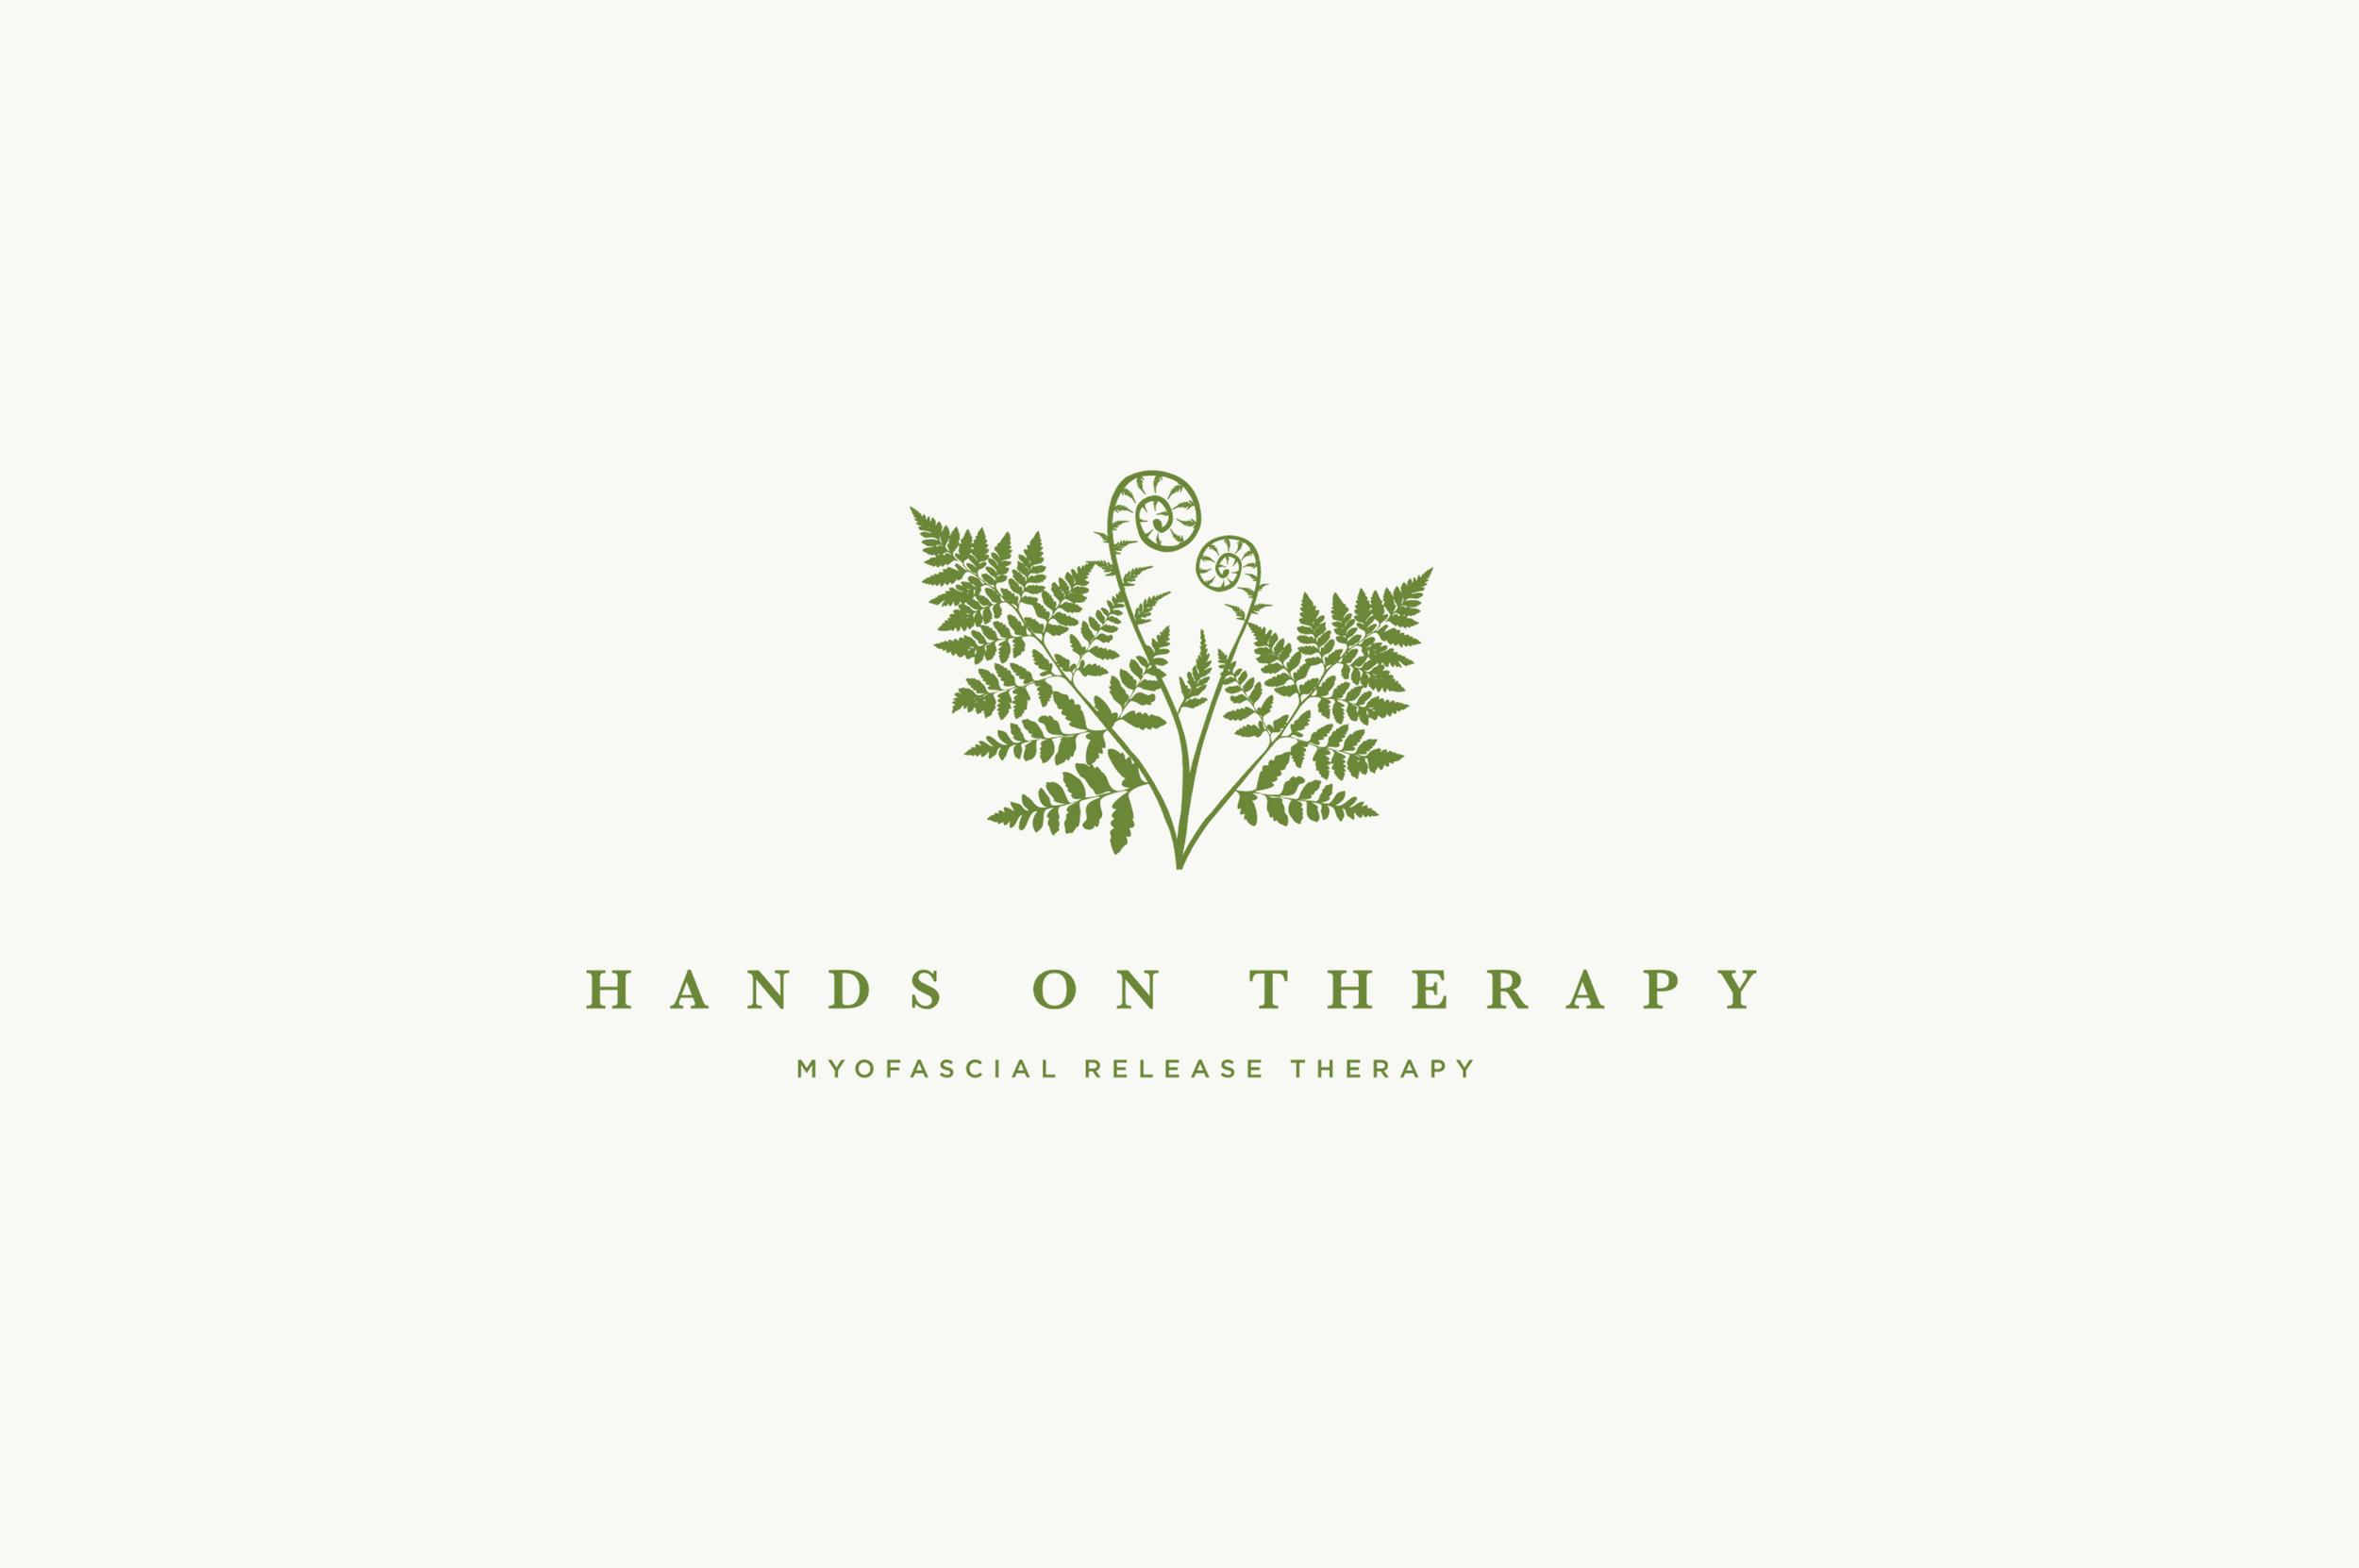 Myofacial-Therapy-Chadds-Ford-Pennsylvania-Logo-Fern-Green2.jpg